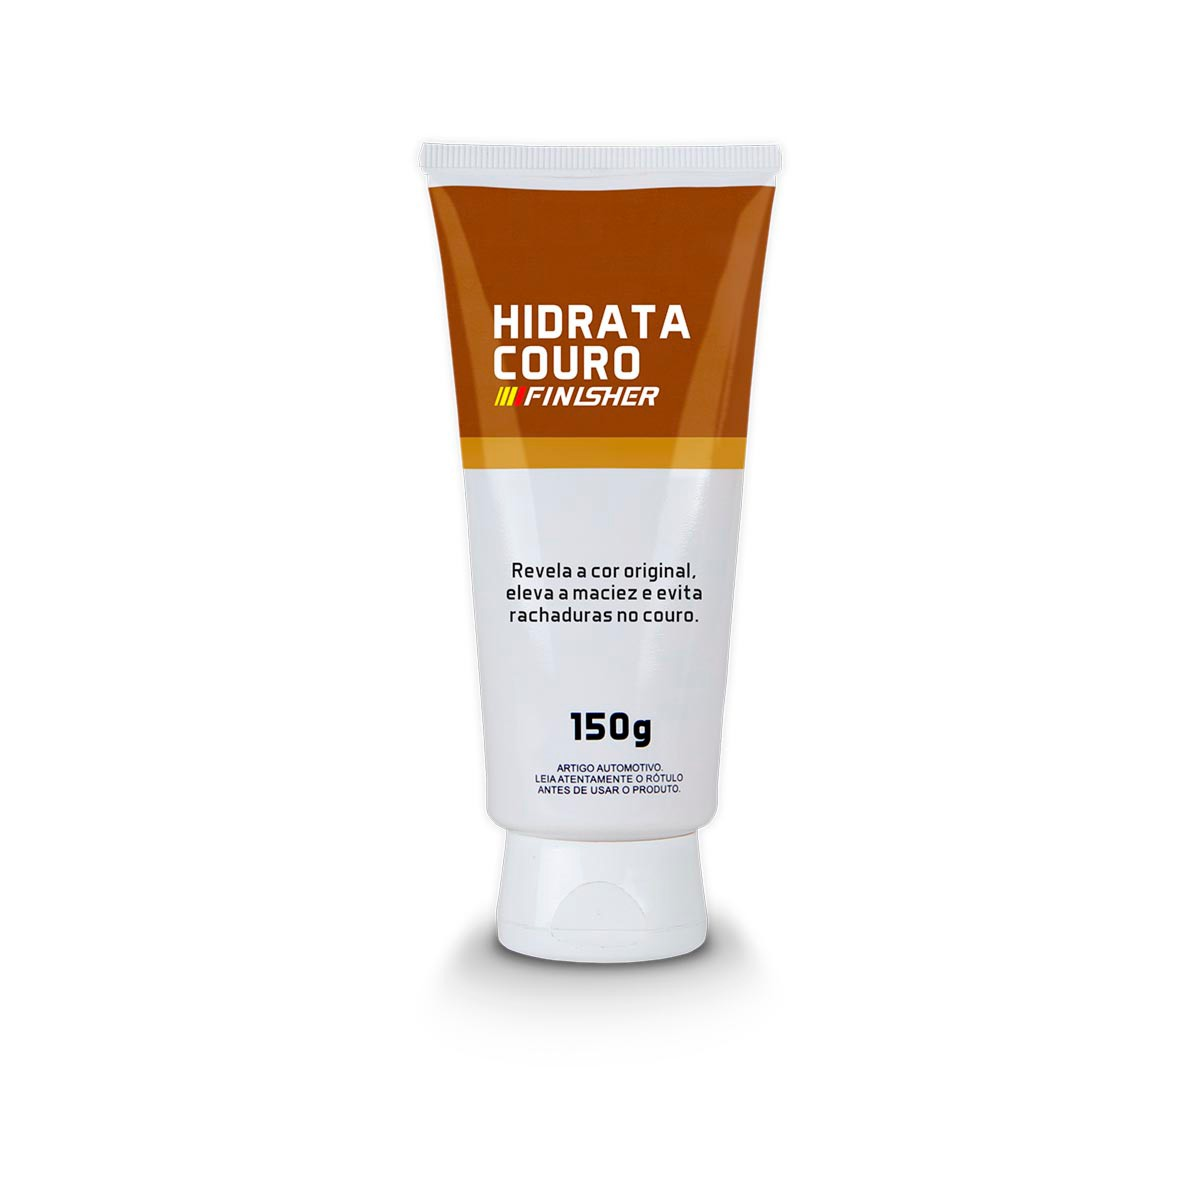 Hidrata Couro 150G - Finisher